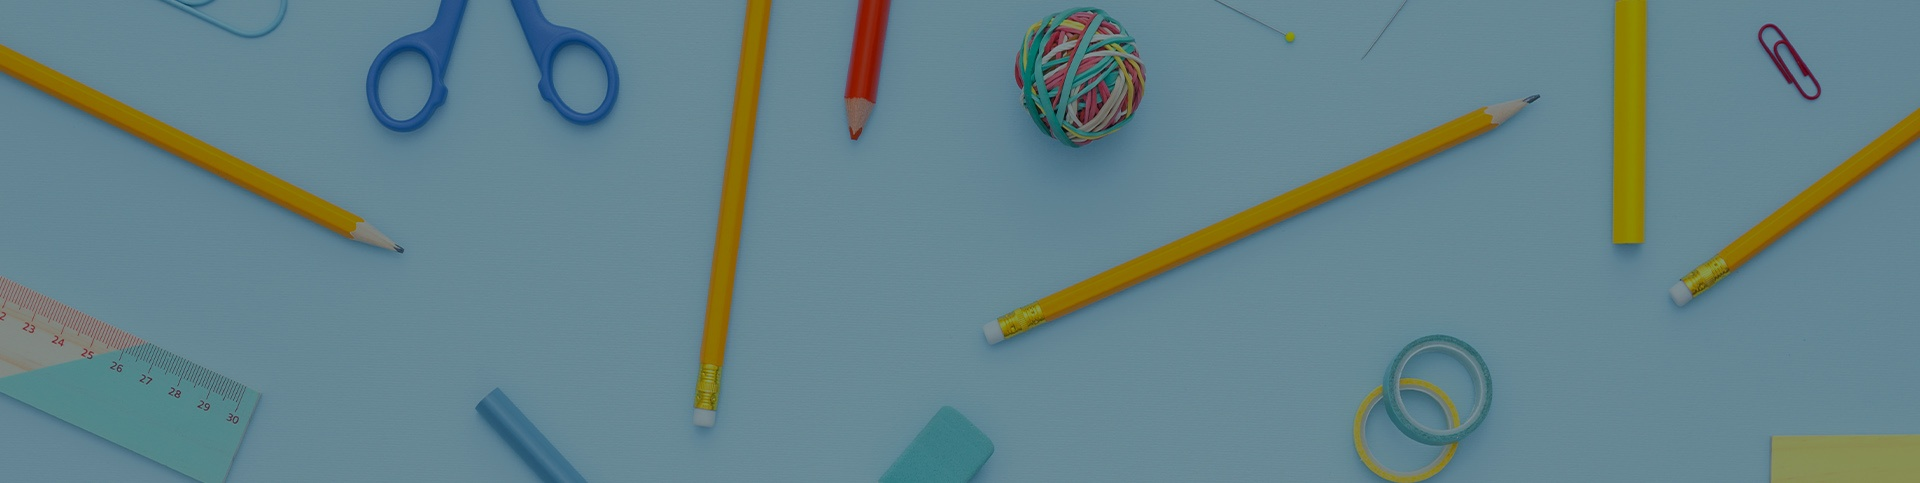 BackSchoolWebinar_LPBanner1